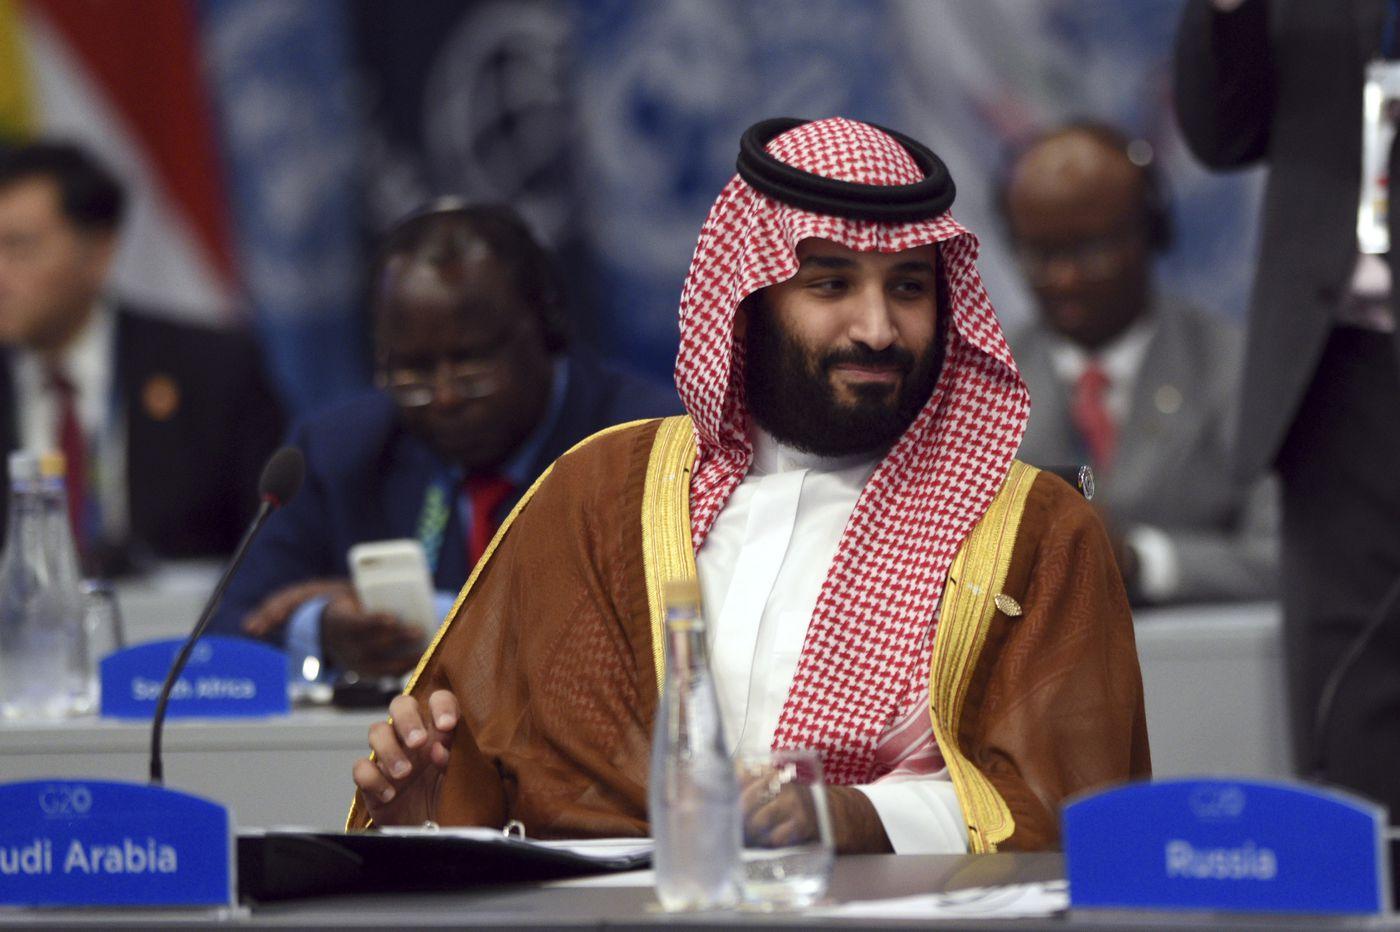 4 reasons why Senate Republicans see the Jamal Khashoggi affair as a turning point | Trudy Rubin